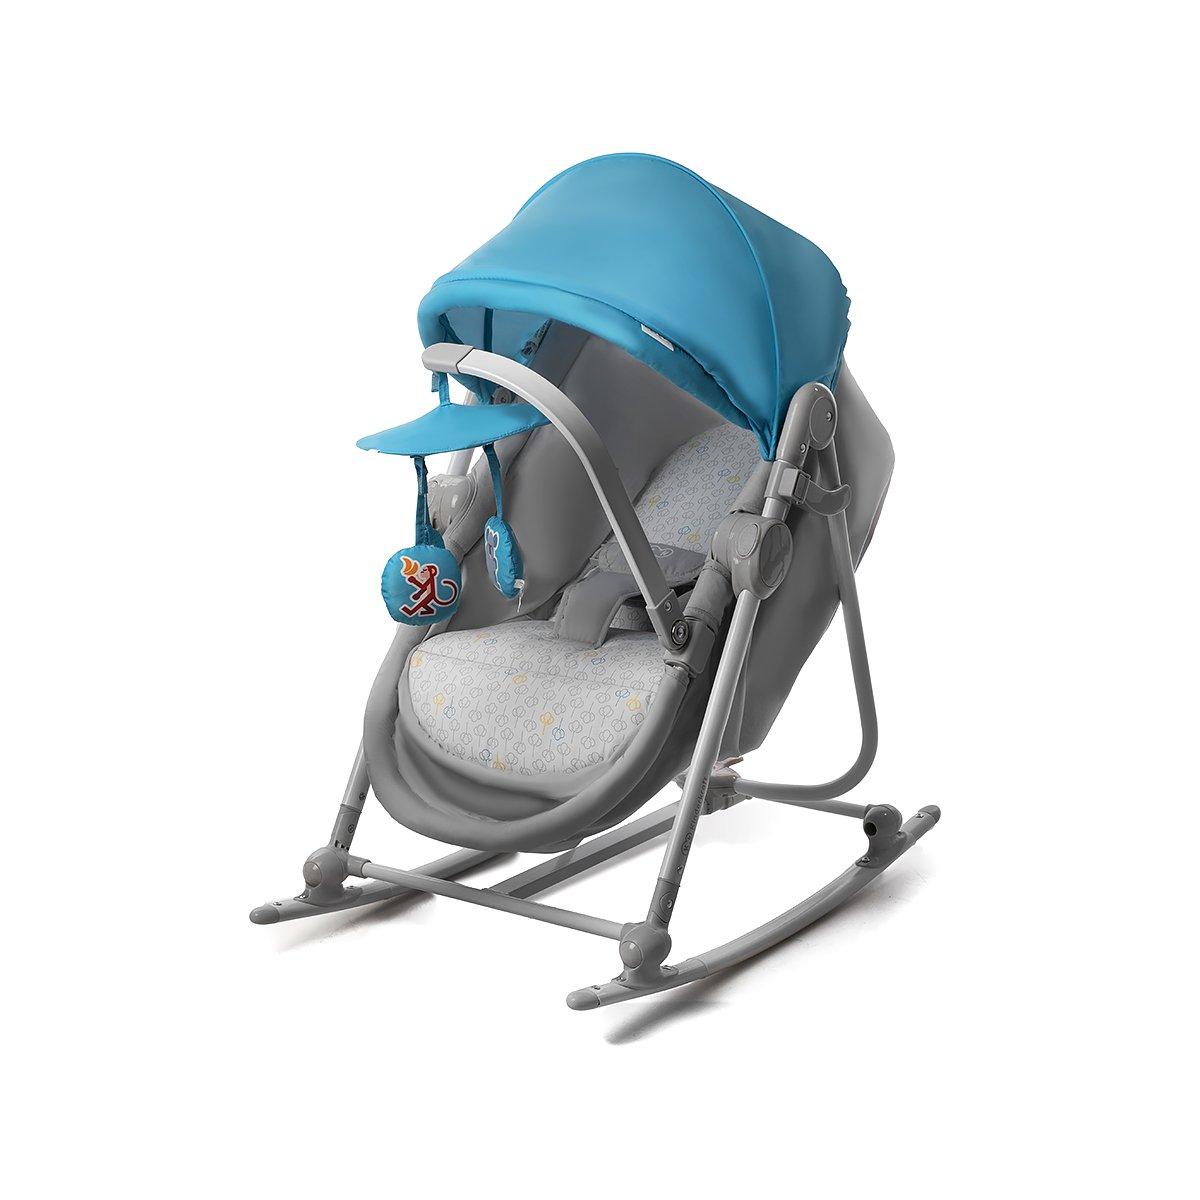 KinderKraft Transat Berceau Unimo, Bleu KKKUNIMBLU0000